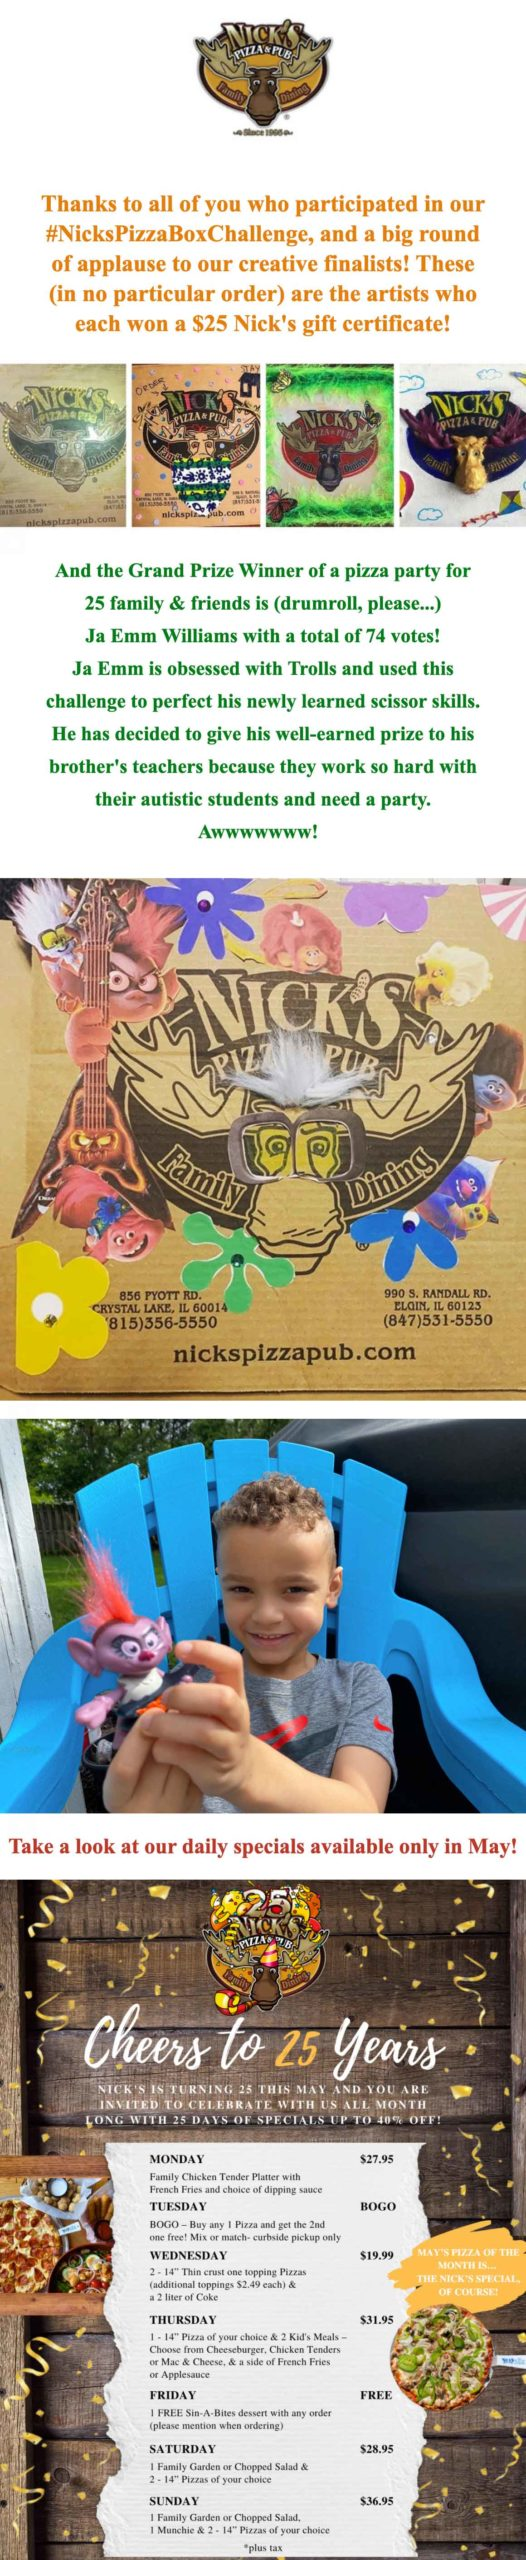 Nick's Pizza & Pub: #NicksPizzaBoxChallenge Winners Email